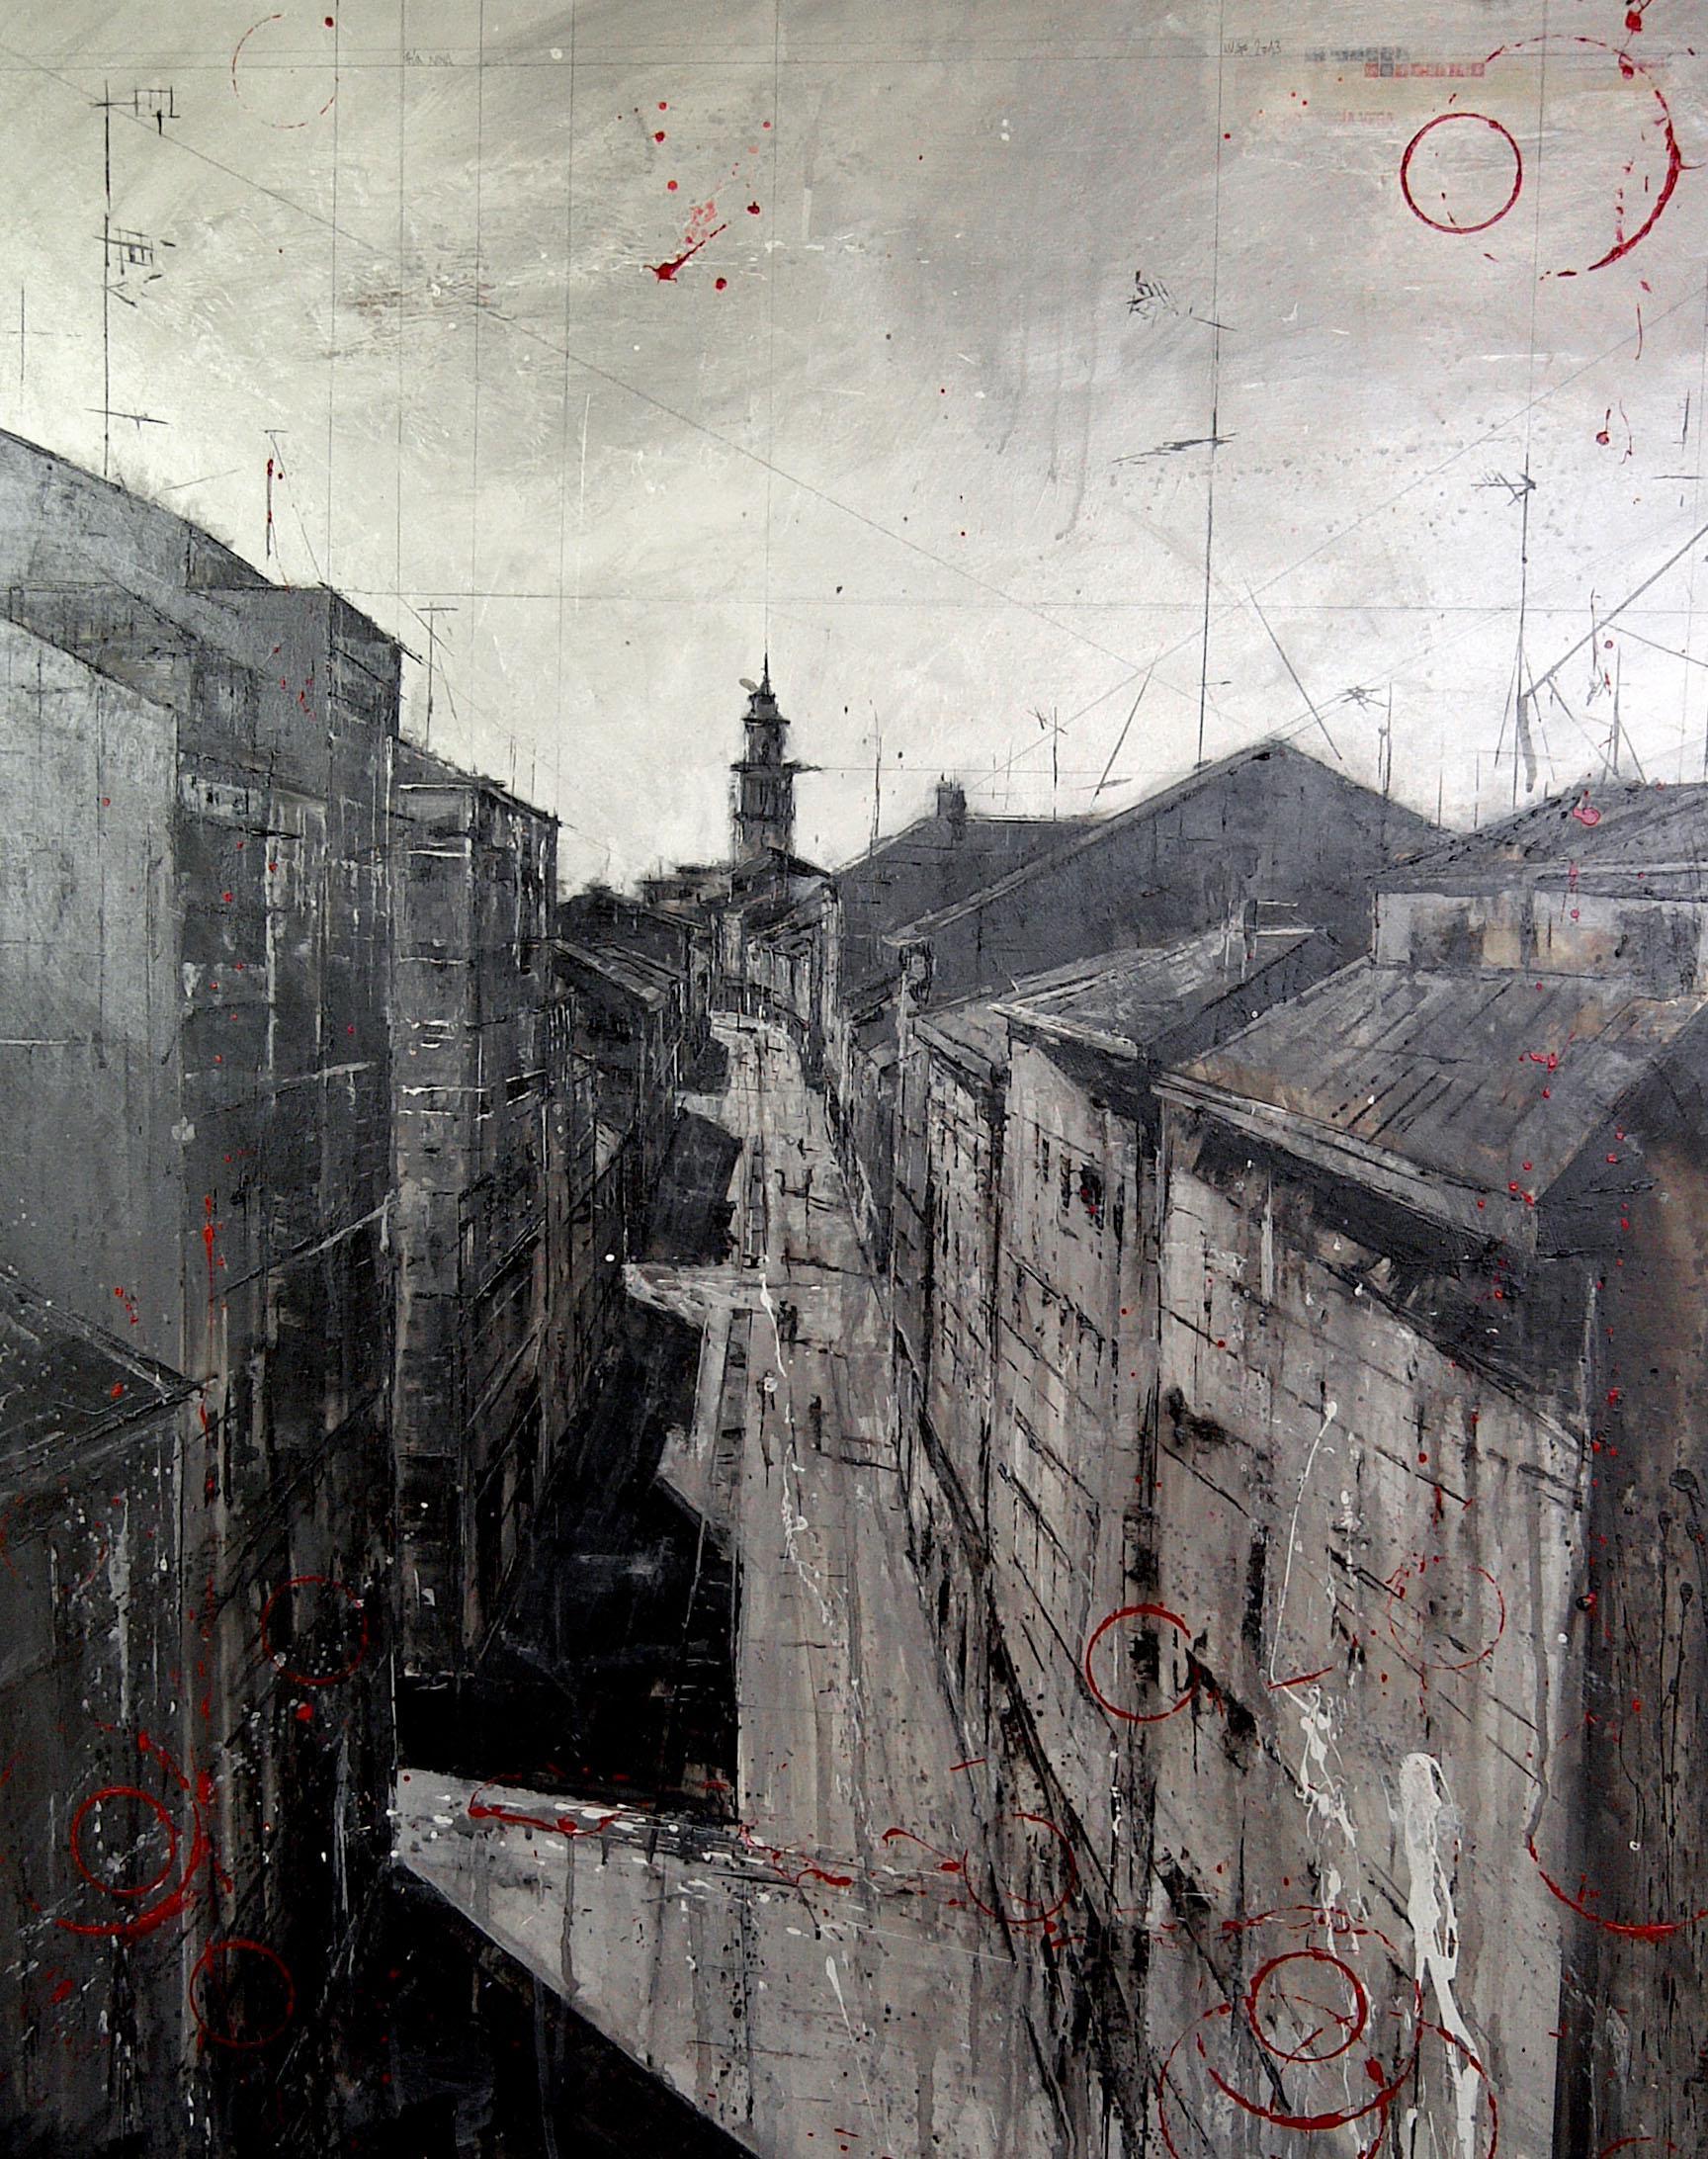 715_lugo_80x100cm_mixed on canvas